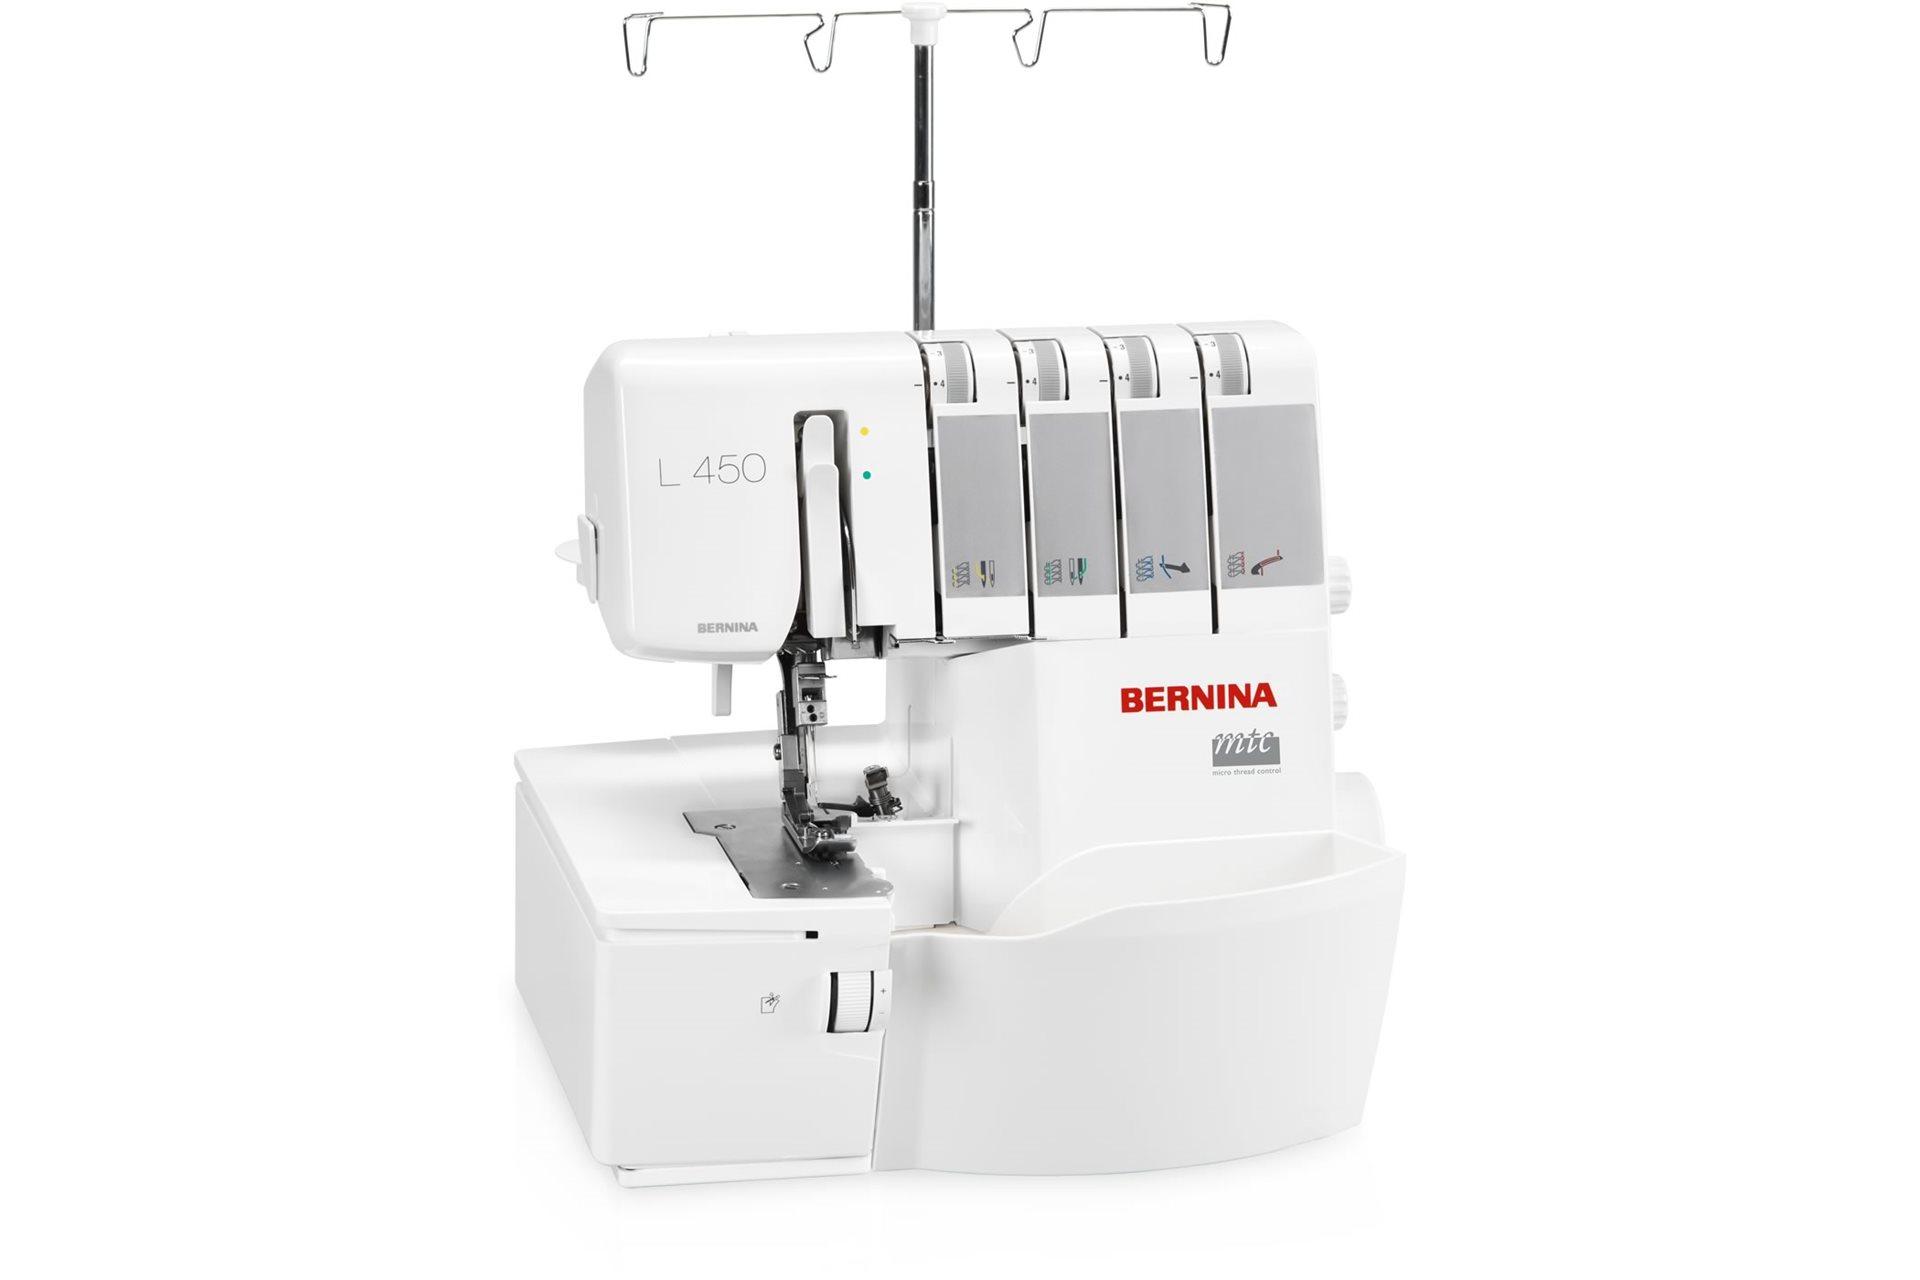 Bernina Quilting Sewing Machines.Bernina Long Arm Quilt Frame ...